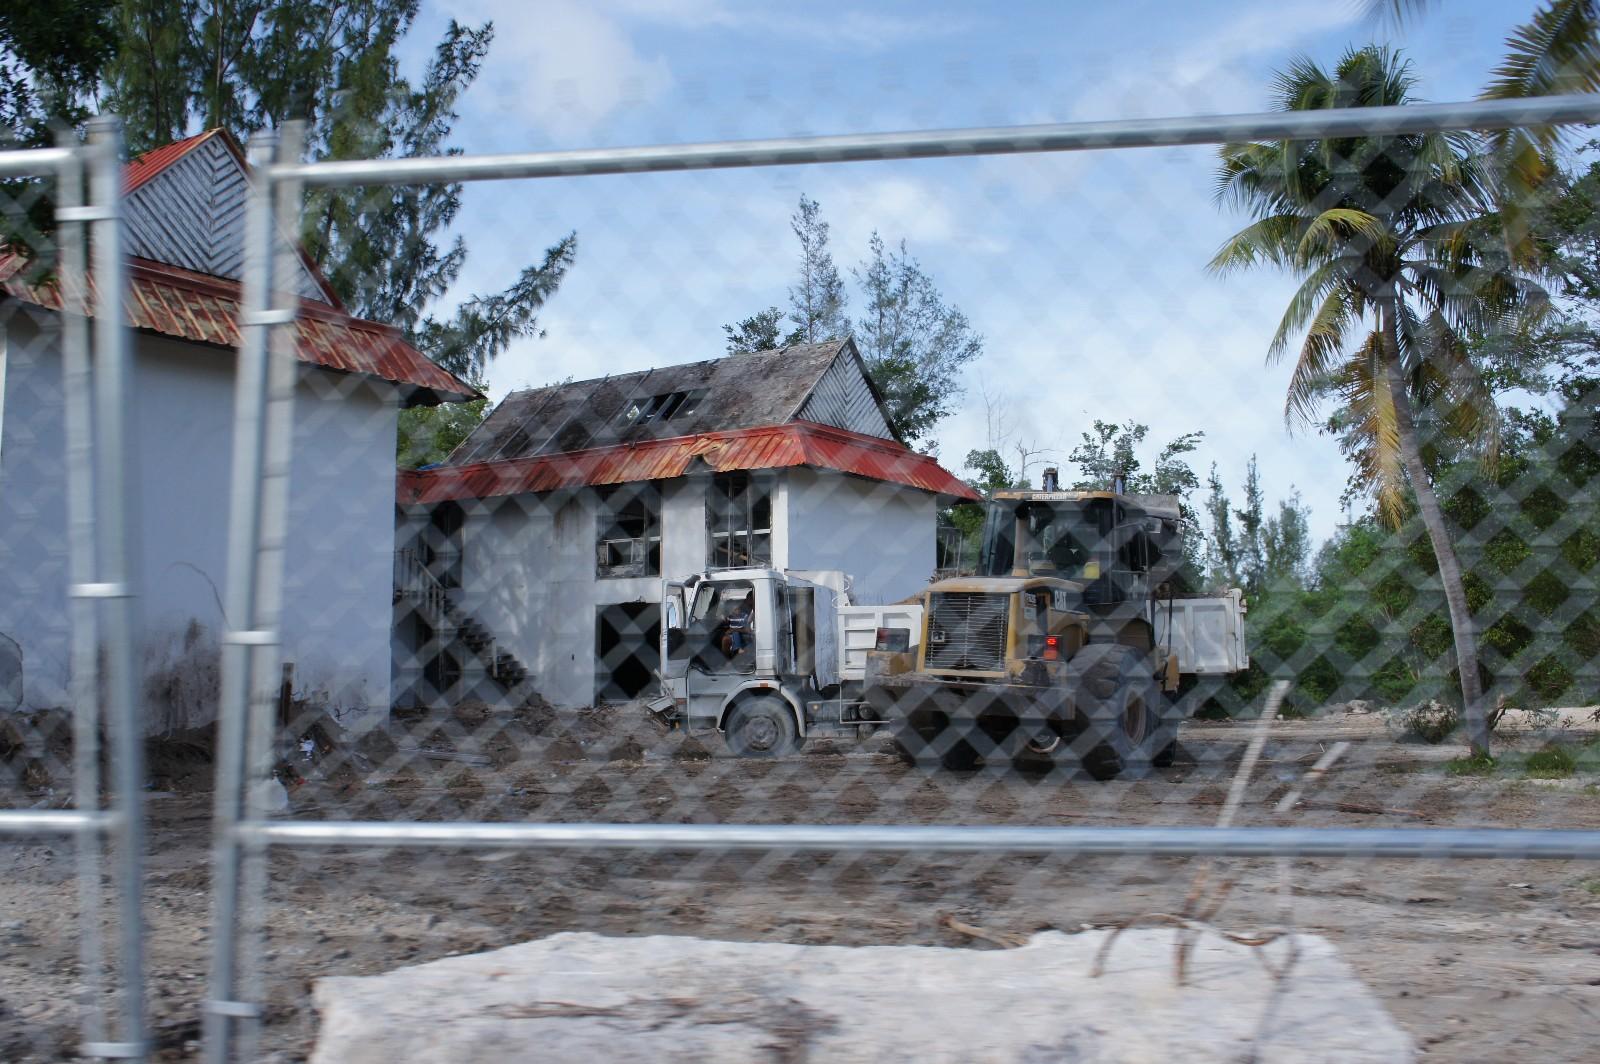 demolition in progress...